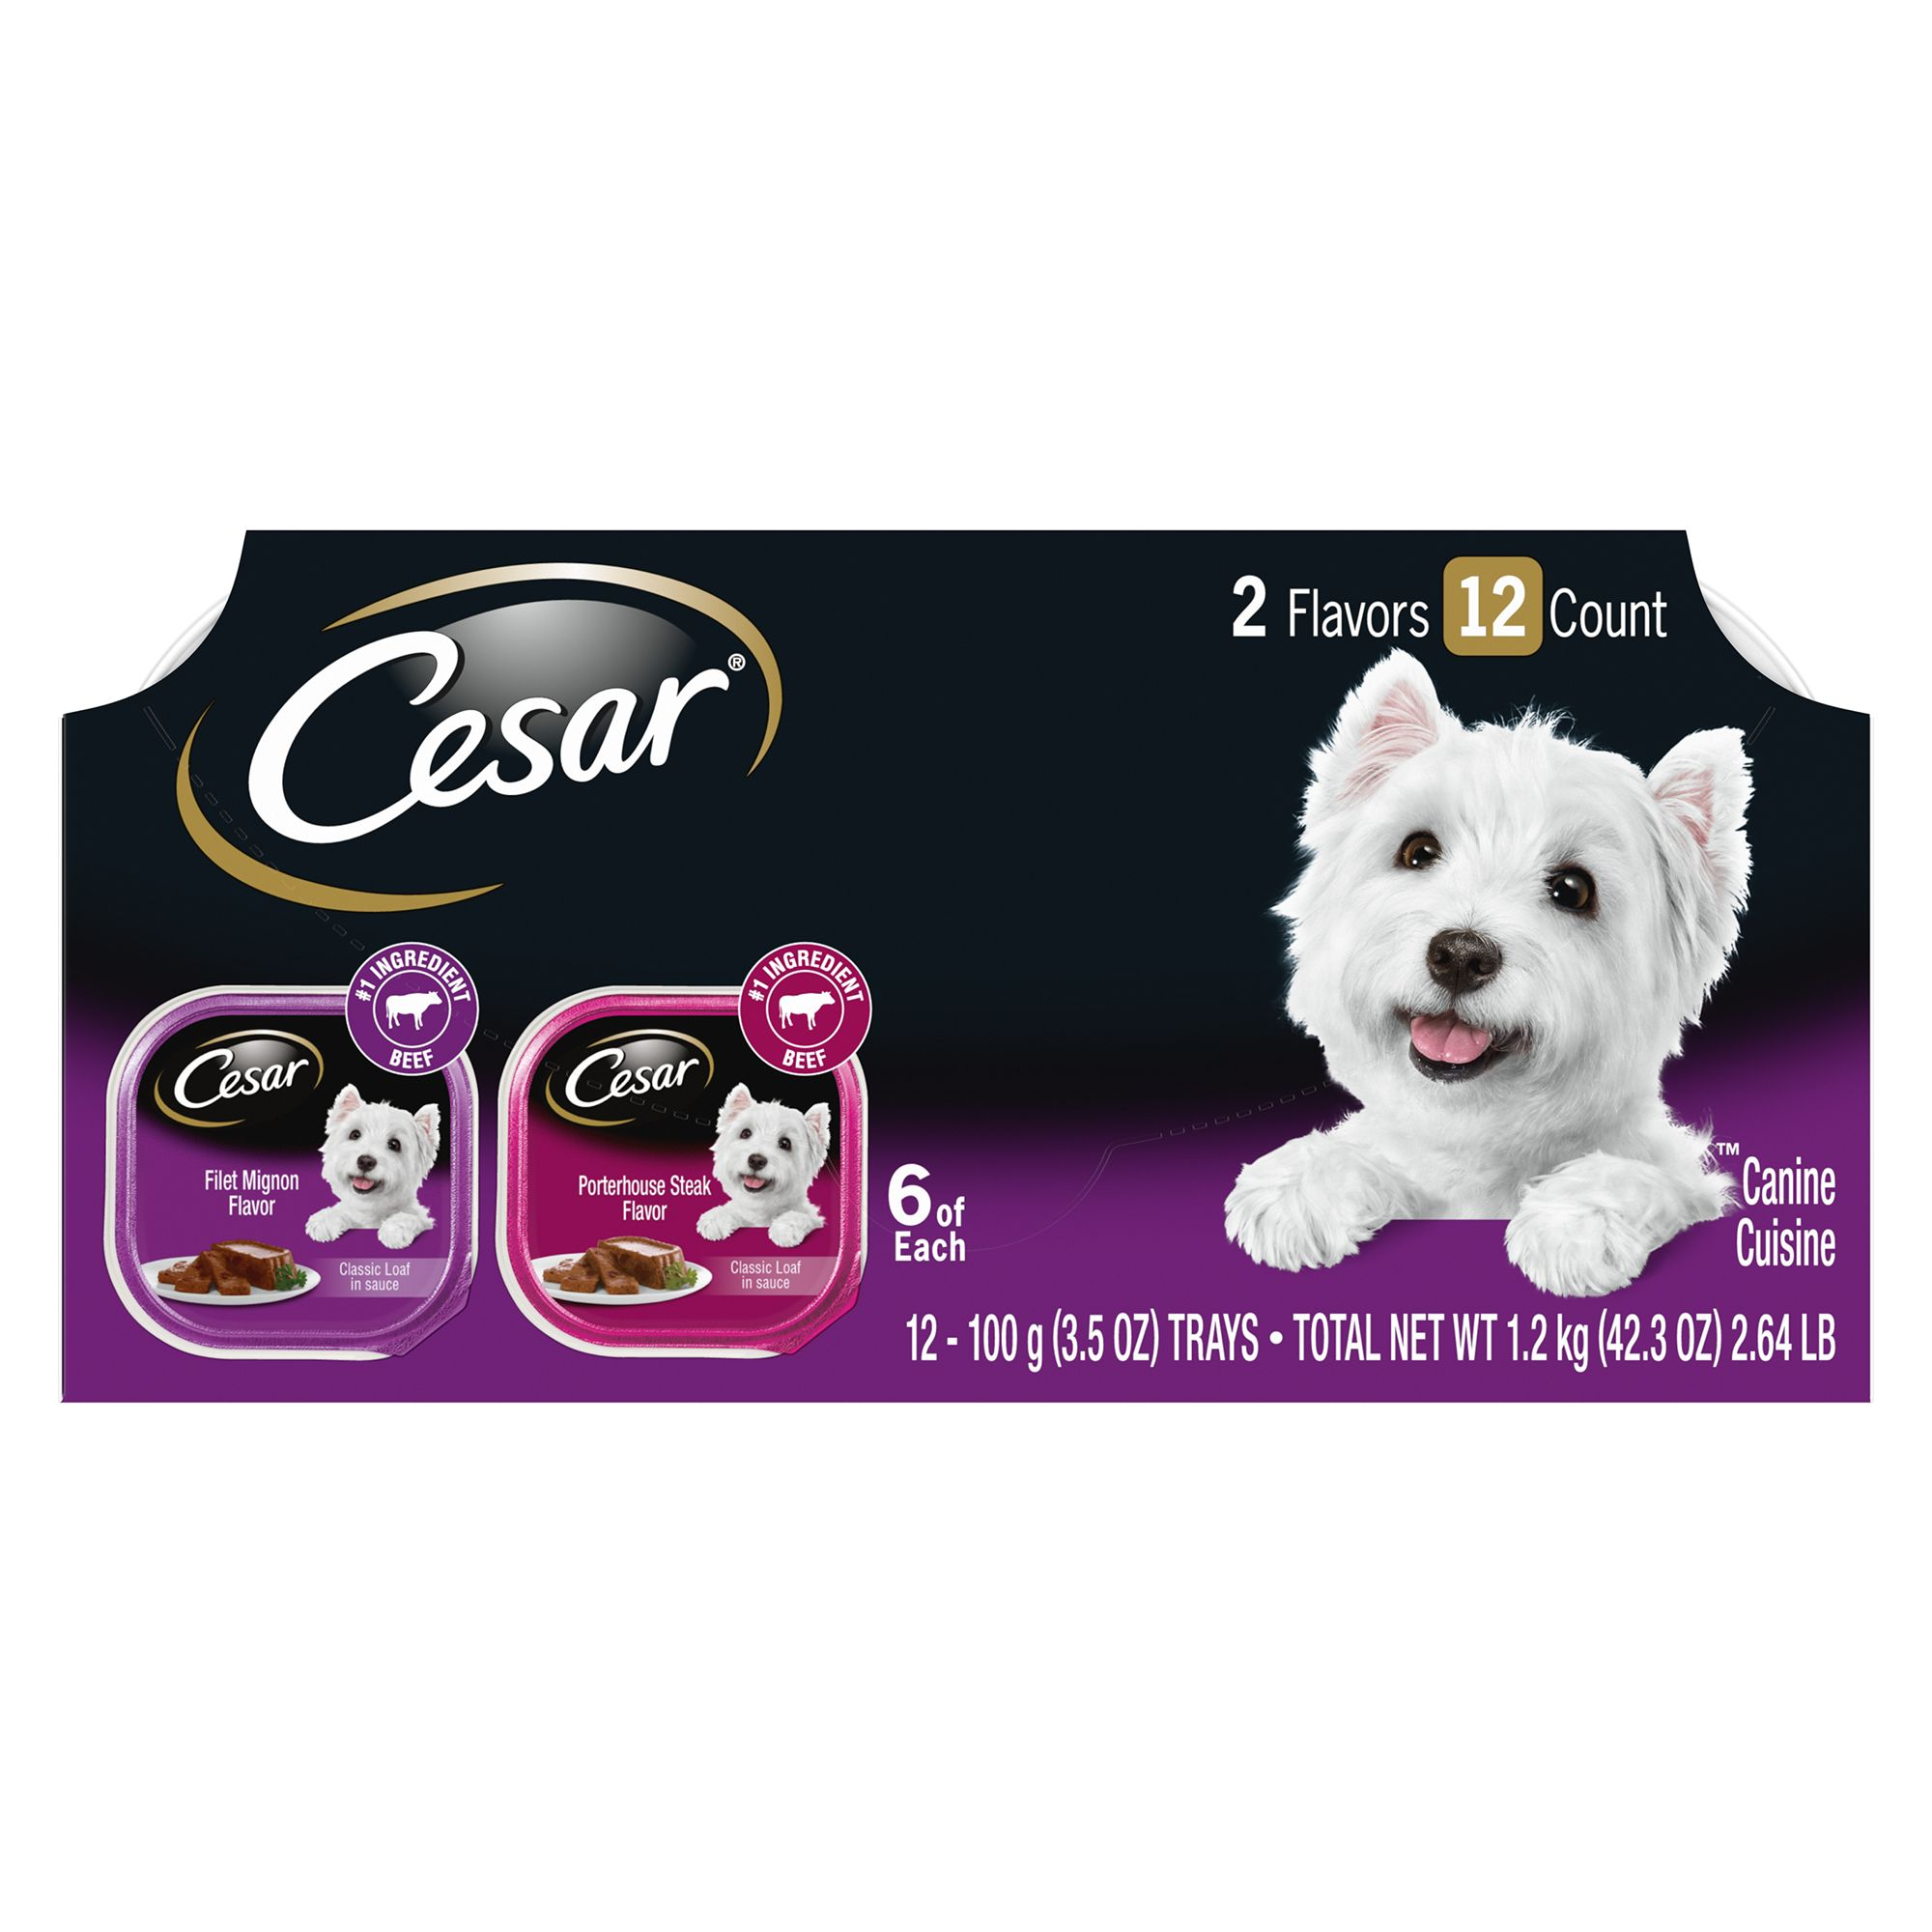 Cesar Canine Cuisine Dog Food Multipack Size 3.5 Oz